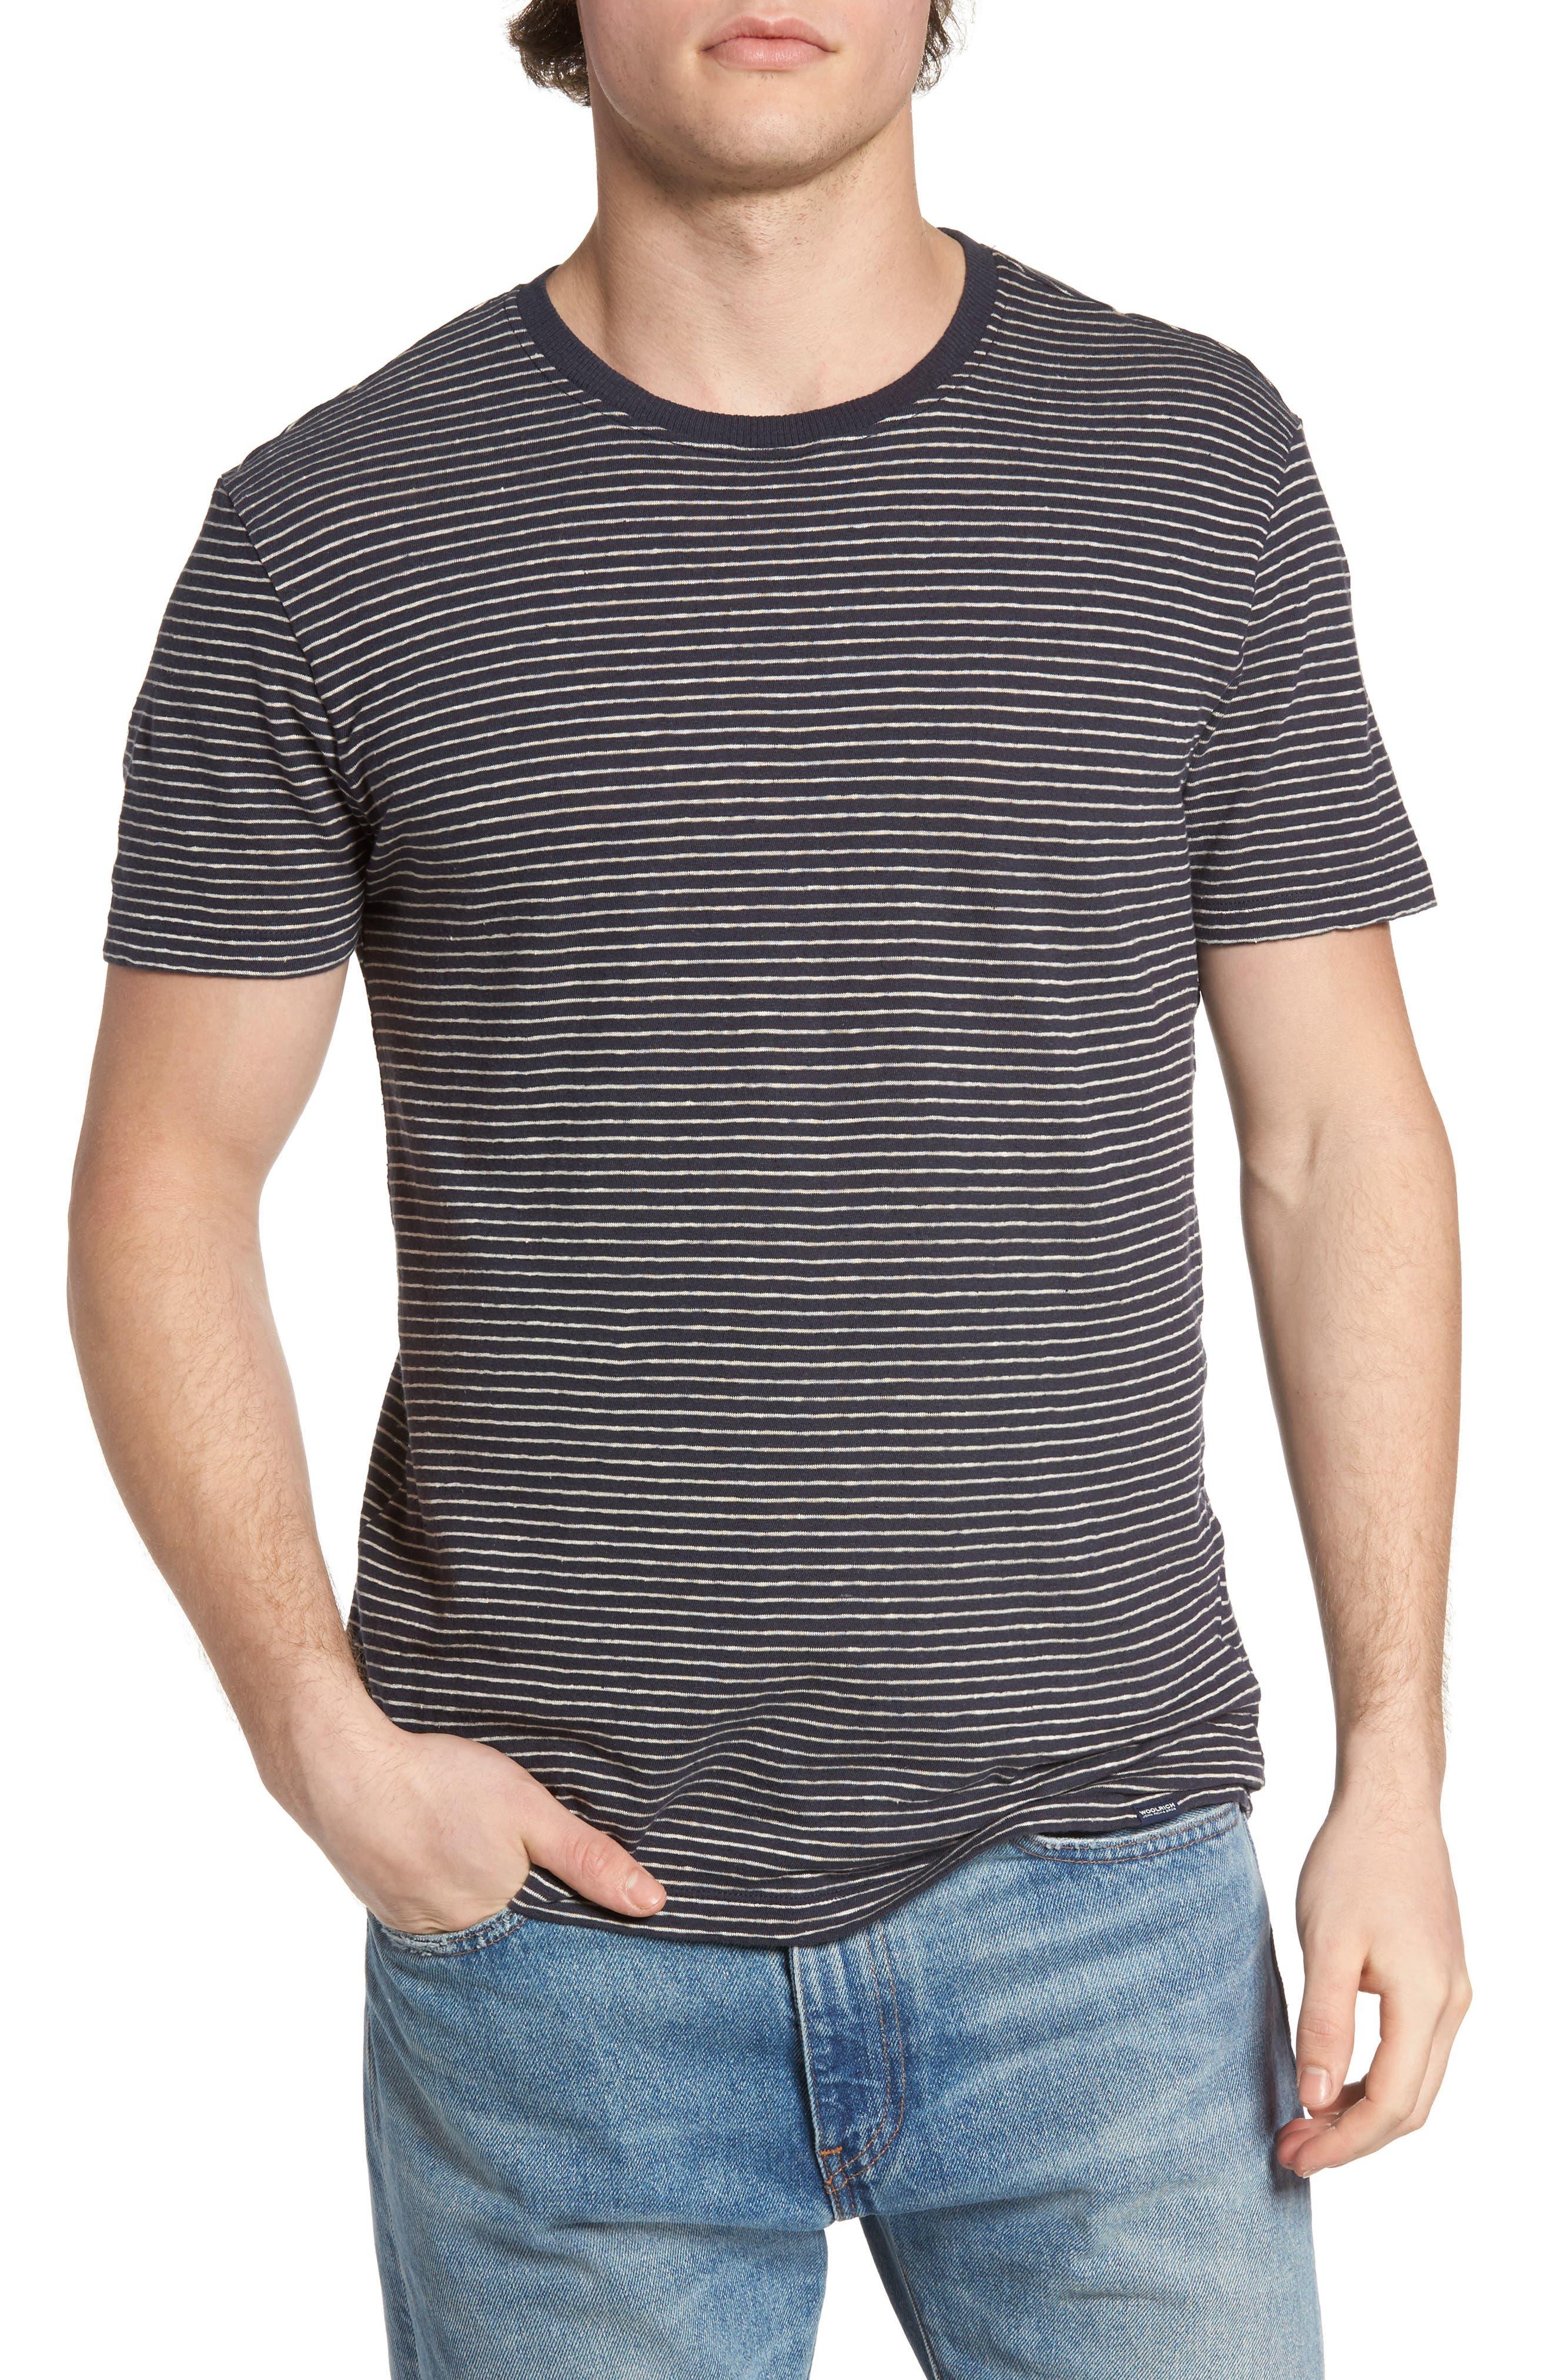 John Rich Stripe Cotton & Linen T-Shirt,                         Main,                         color, Dark Navy Stripe B